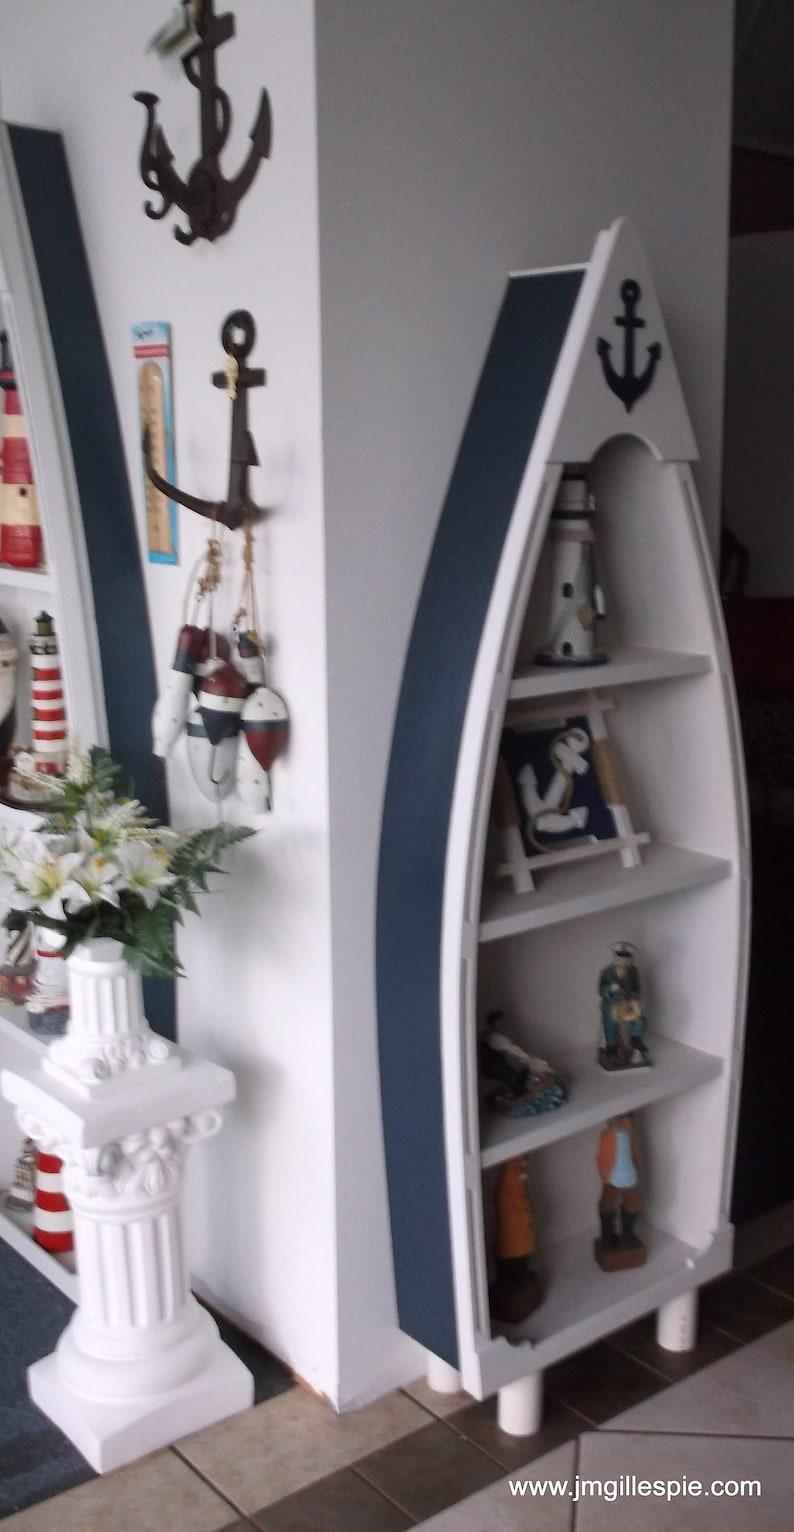 5 Boat Shelf Navy Blue And White With Anchor Baby Nursery Wedding Skiff Dory Cottage